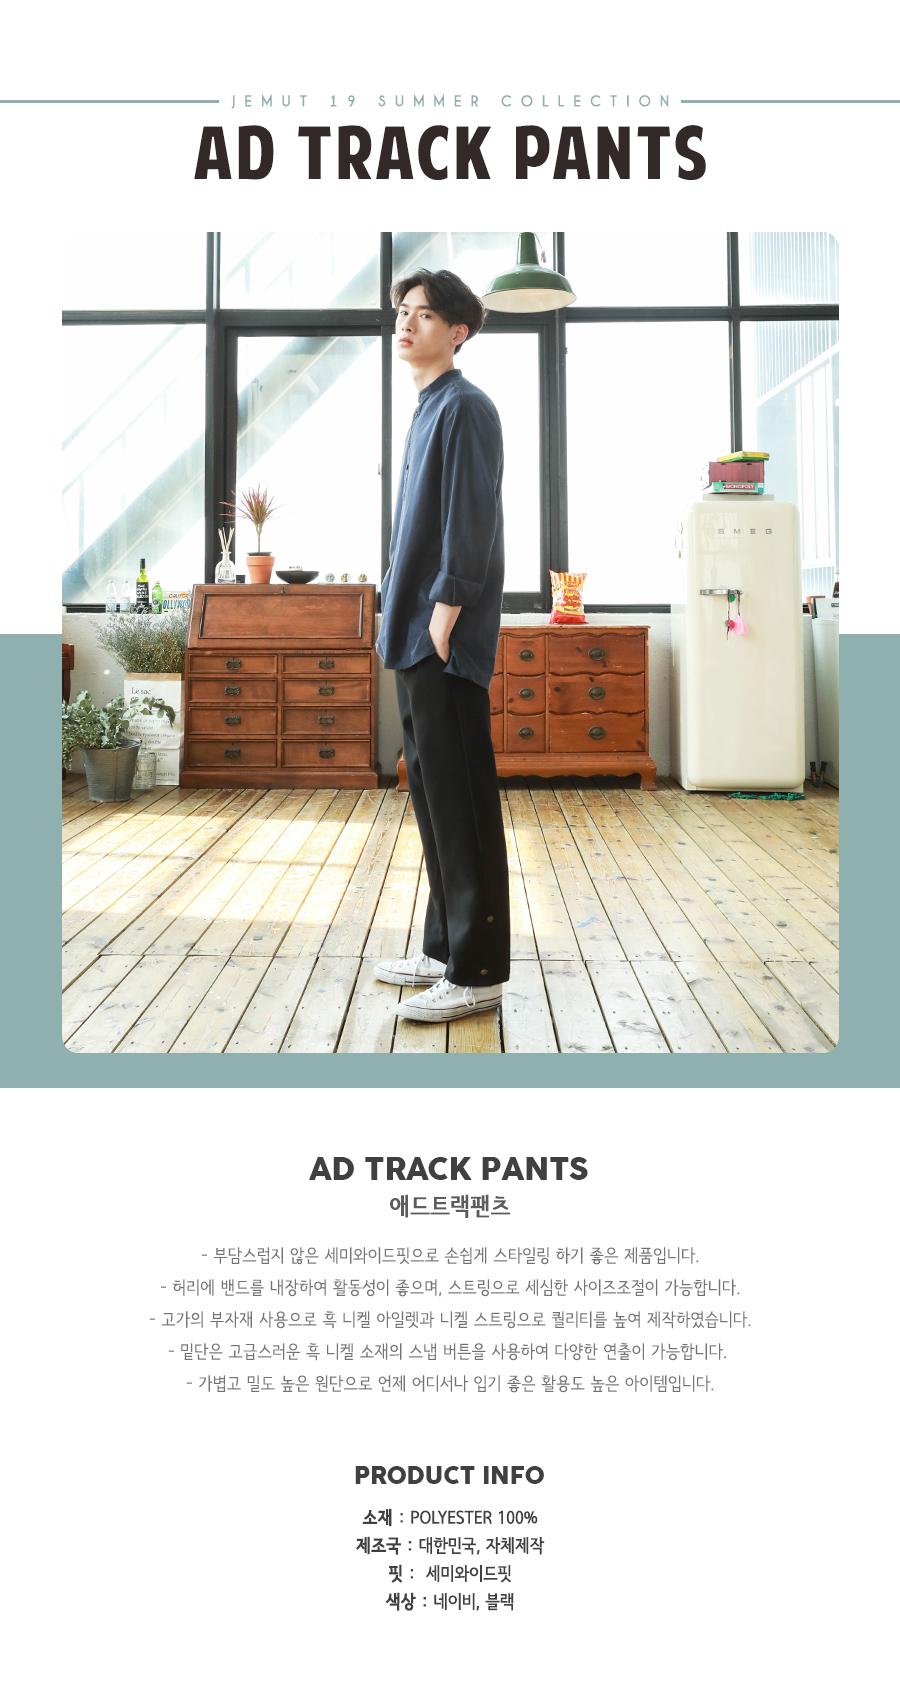 20190321_add_track_pants_title_kj.jpg